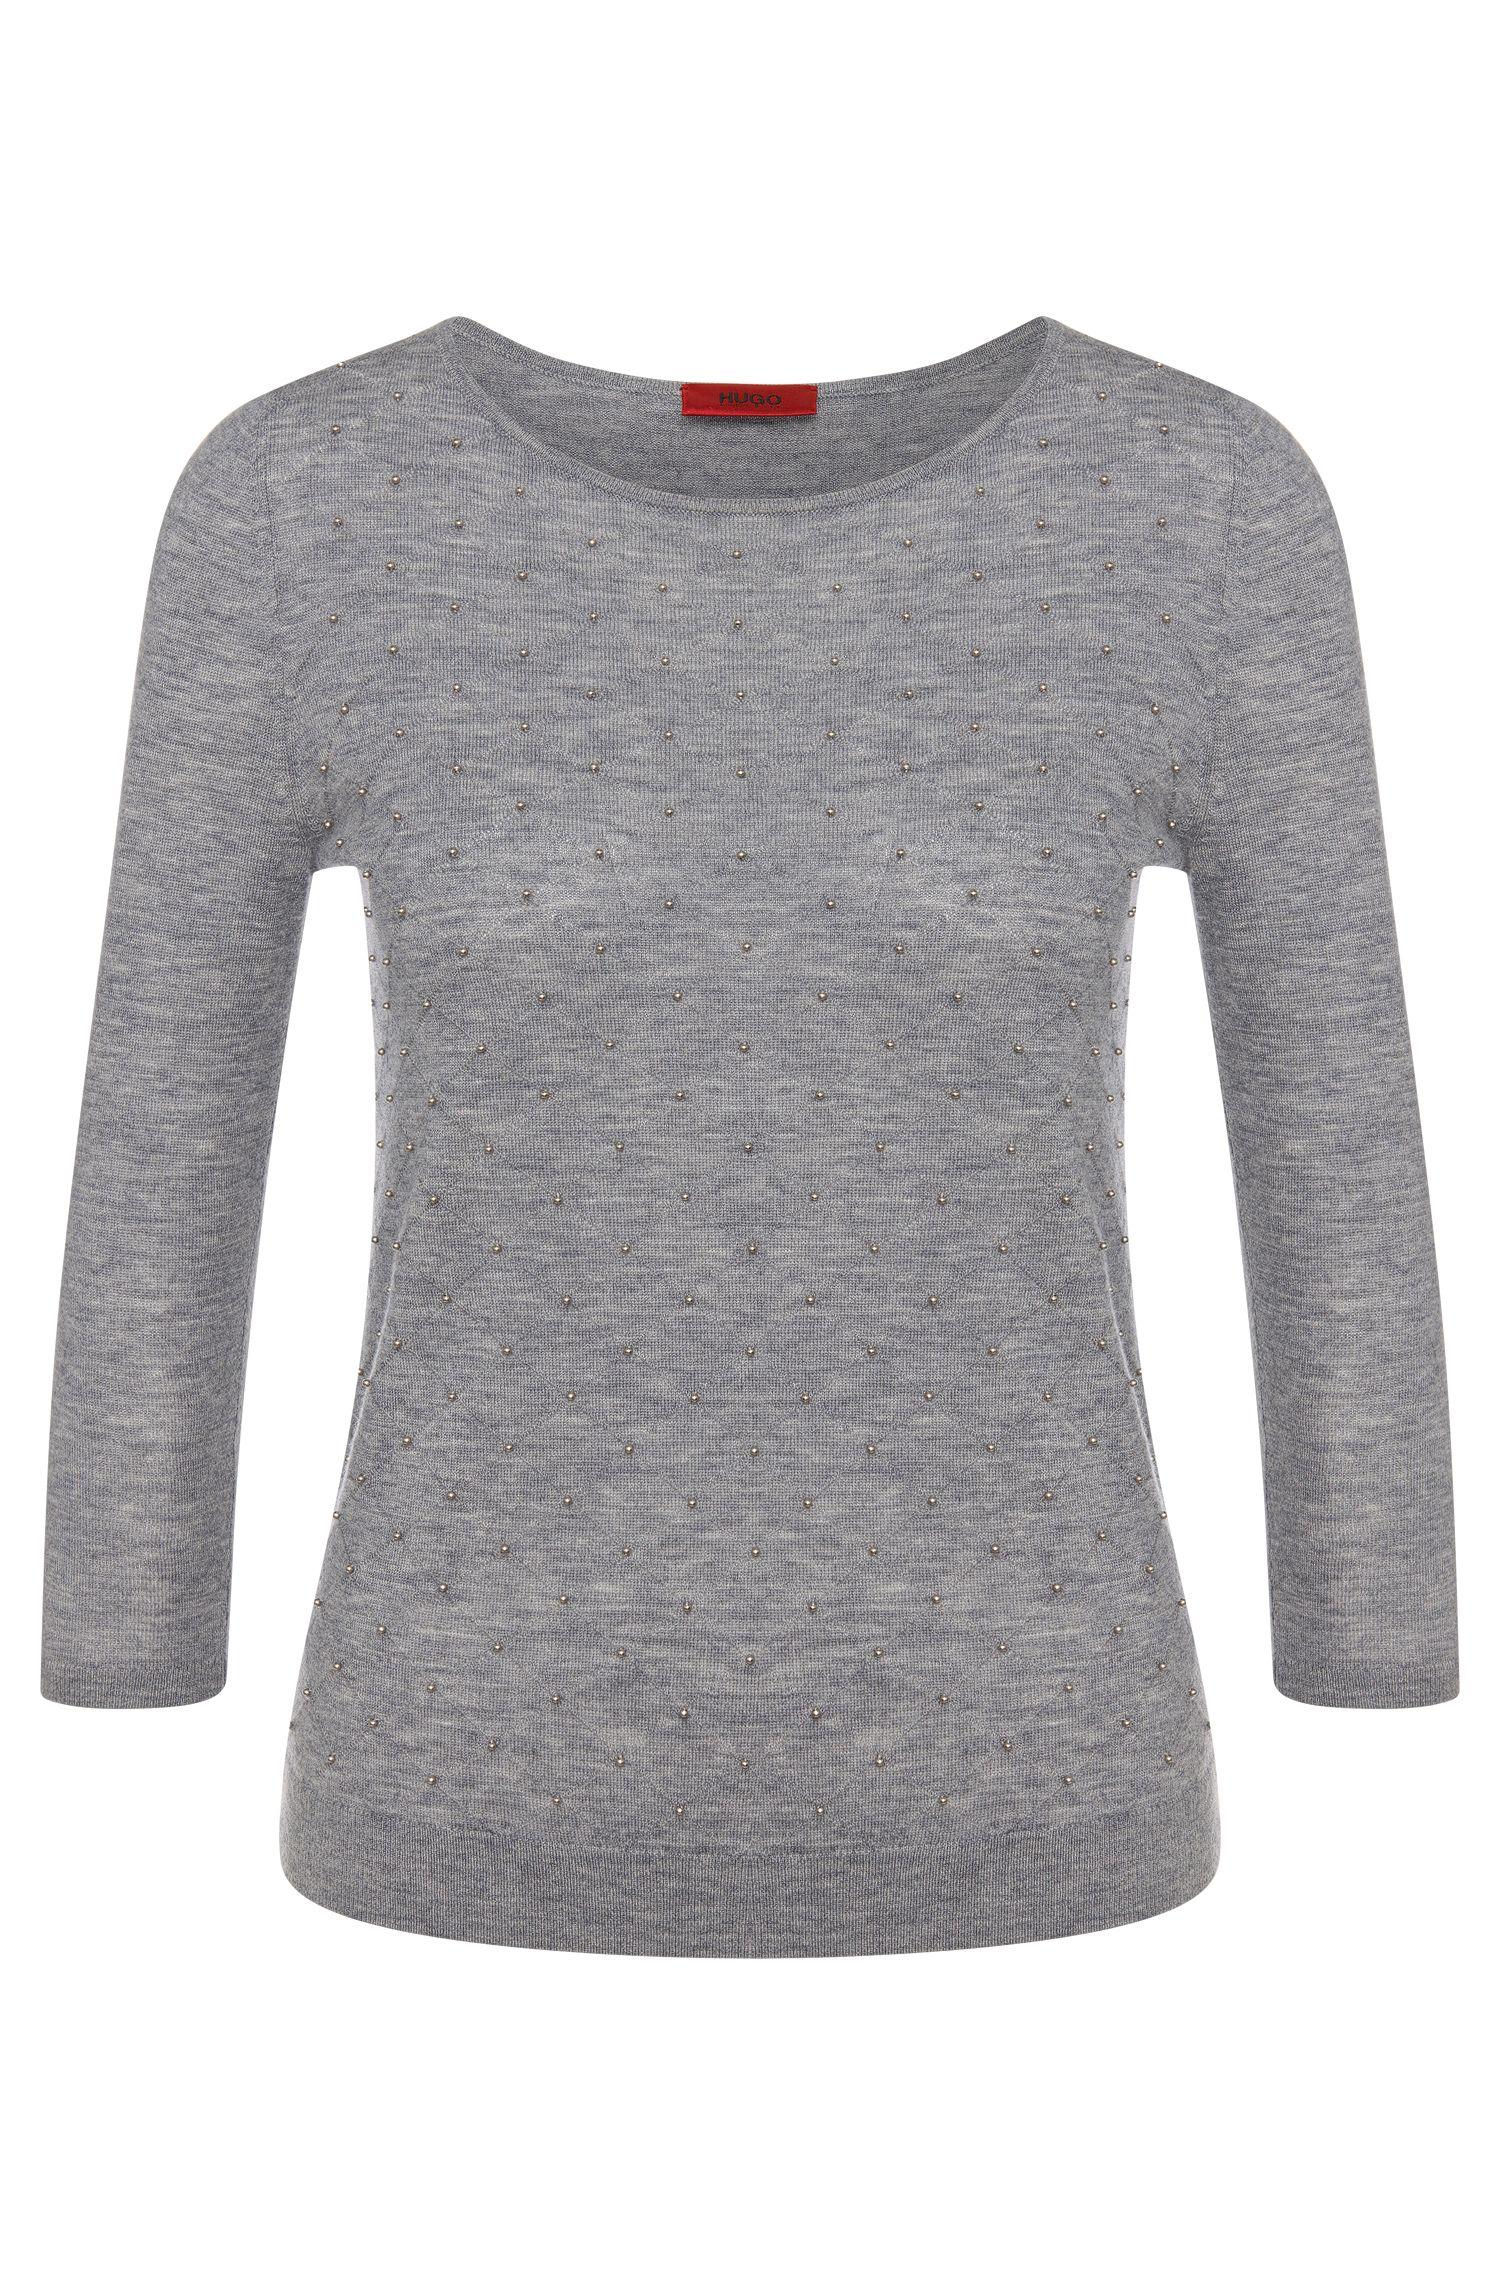 Jersey en mezcla de lana virgen con cachemira: 'Selline'